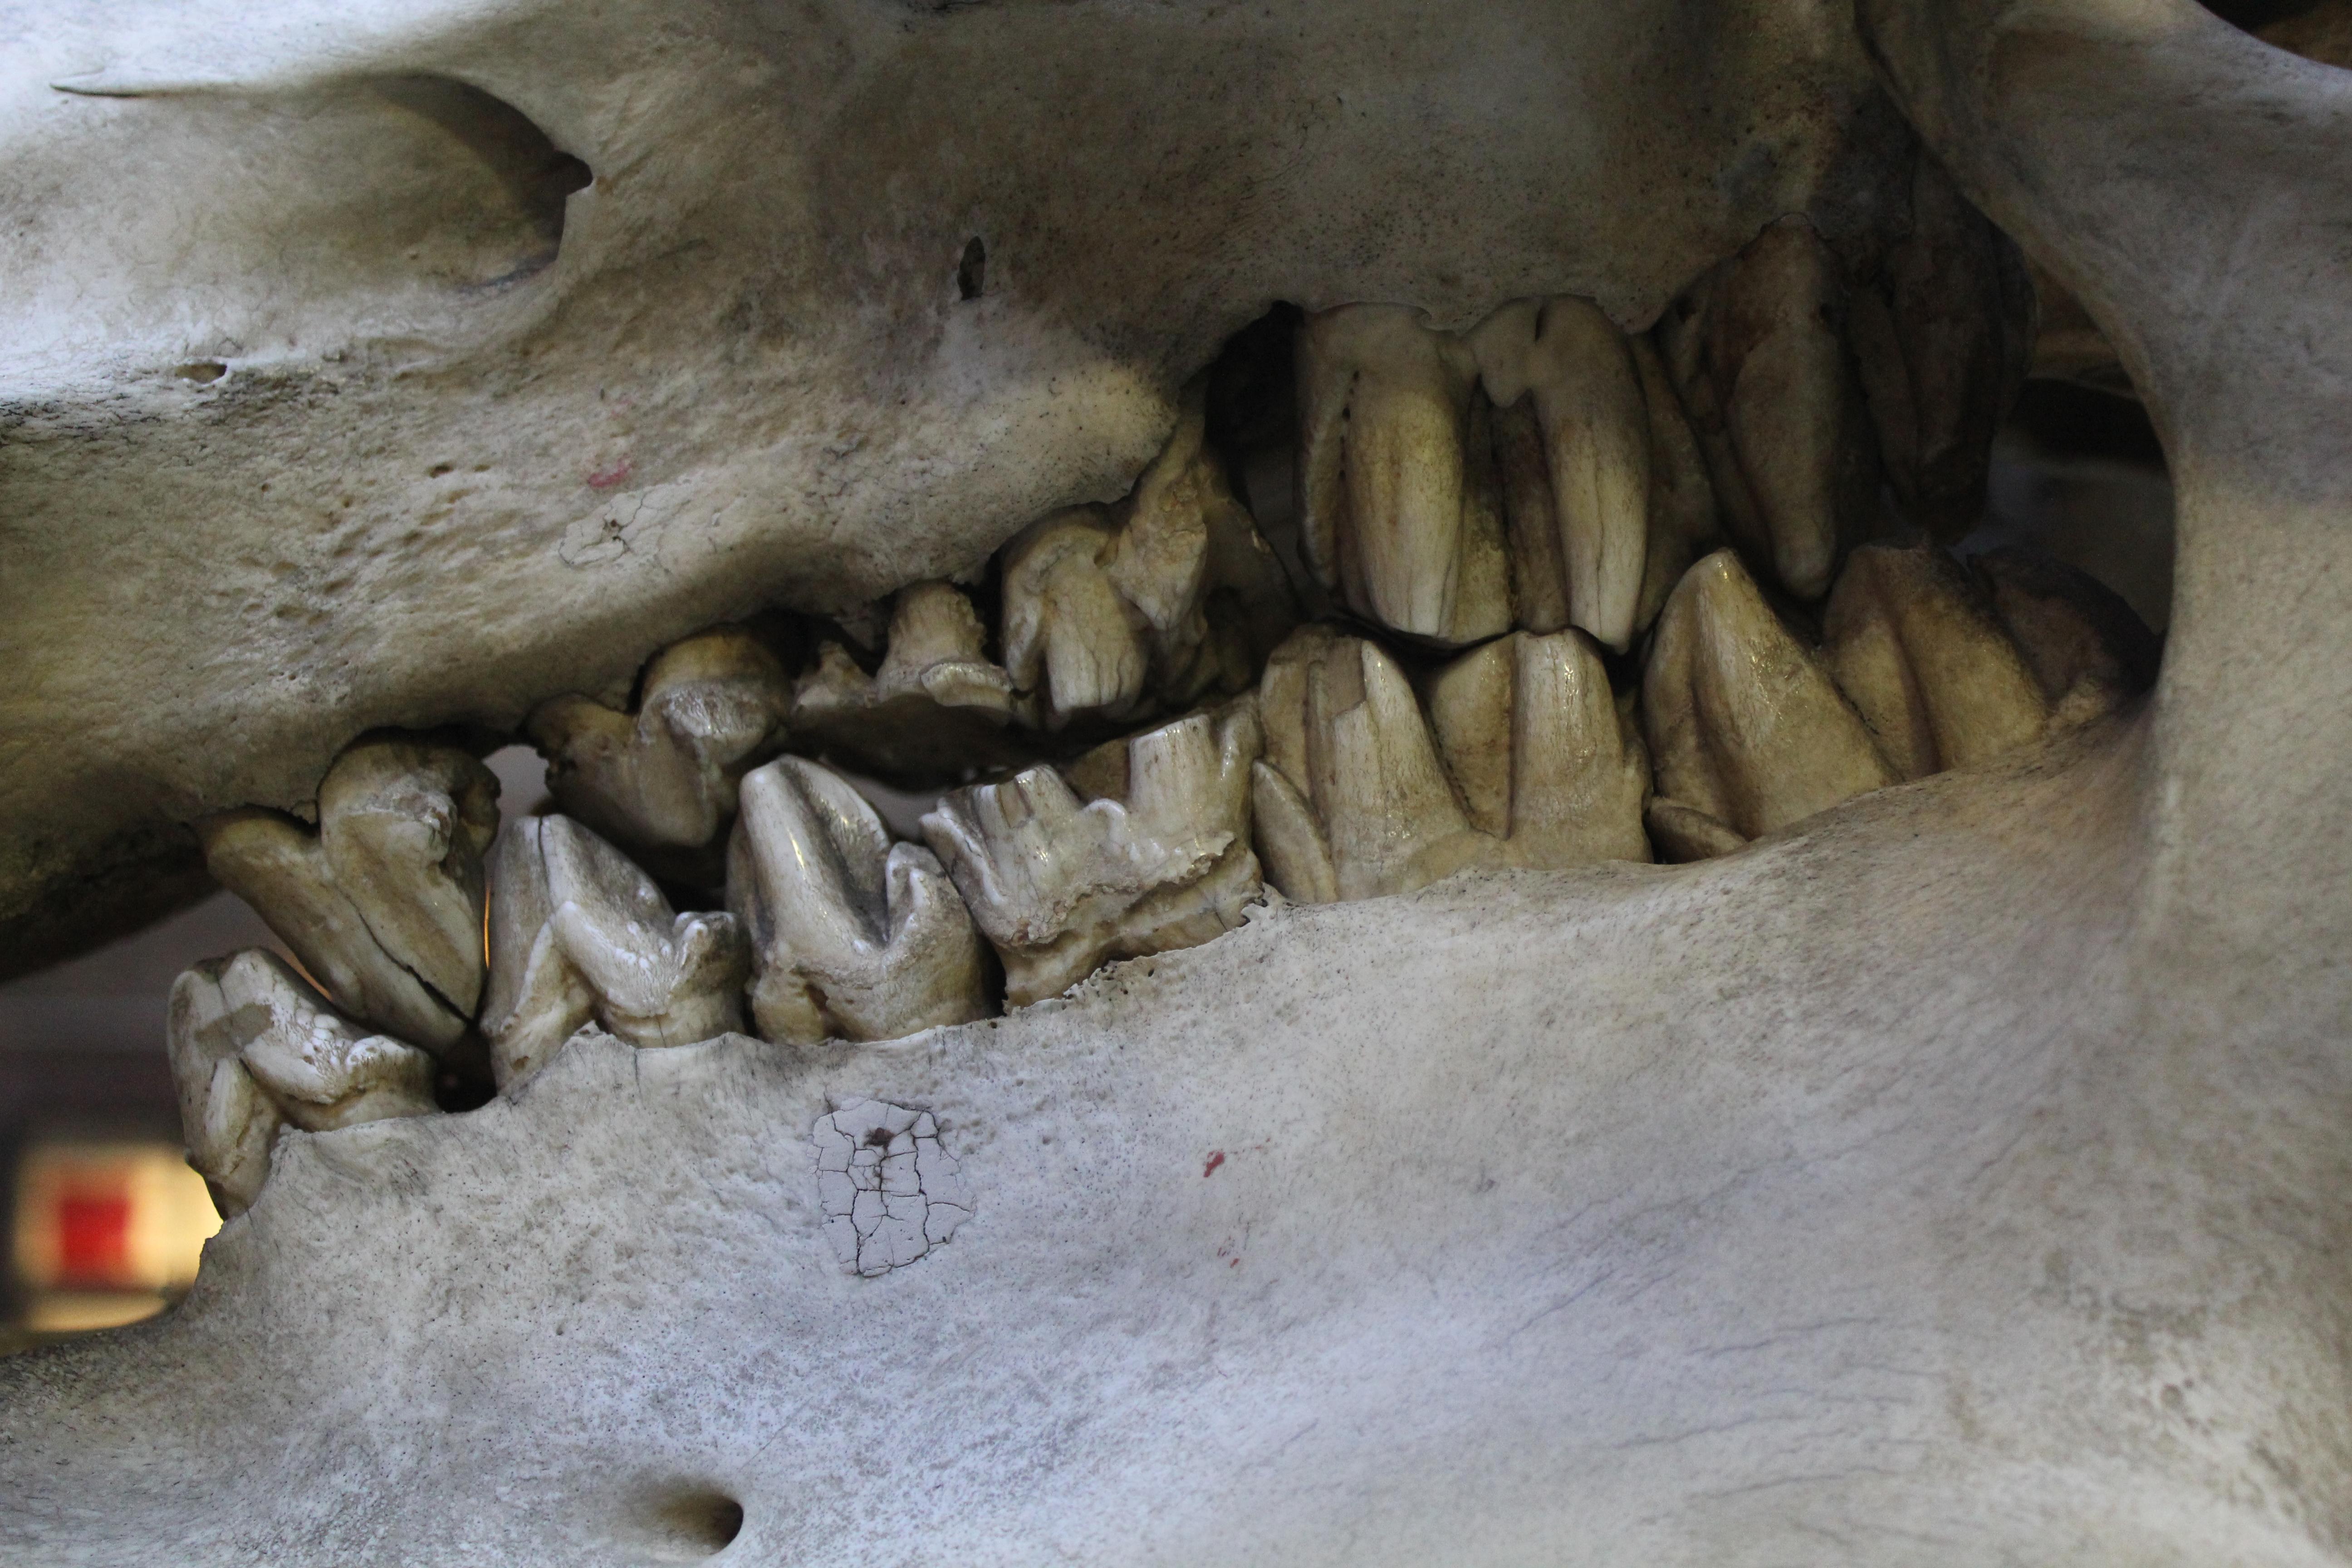 File:Hippopotamus skull teeth 2 (Hippopotamus amphibius) at the ...